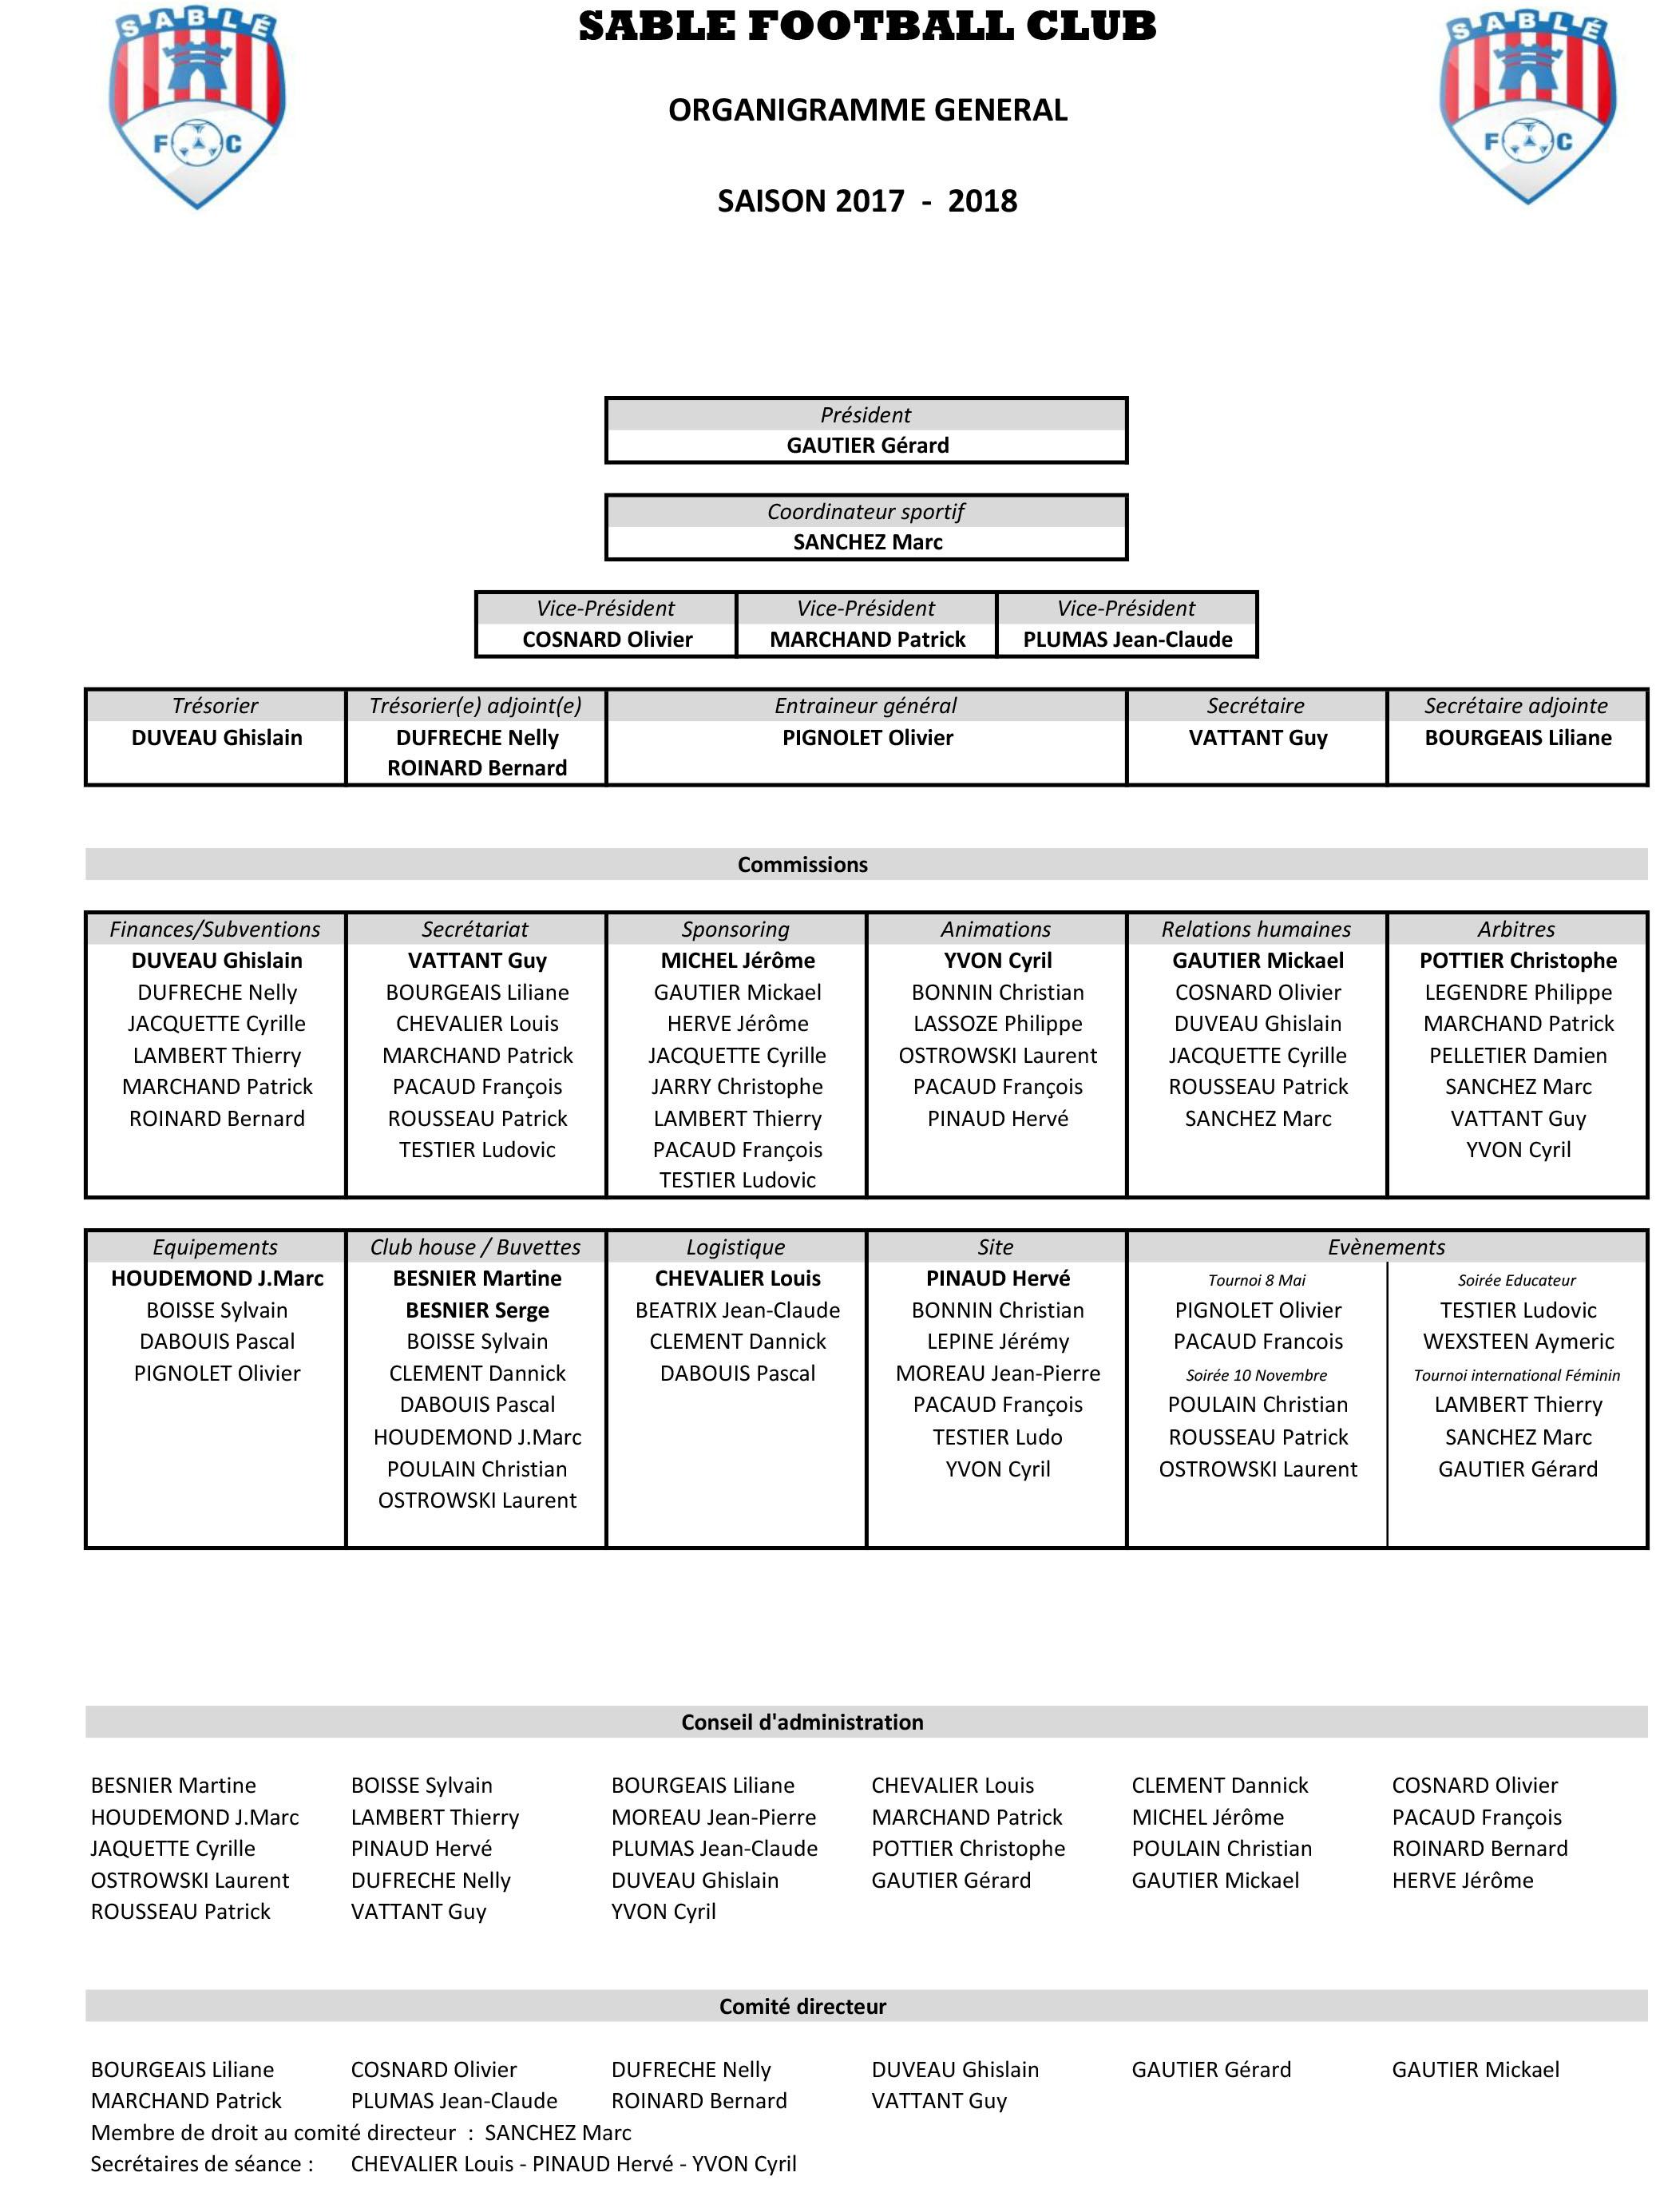 Organigramme administratif 2017 - 2018 version 4.jpg